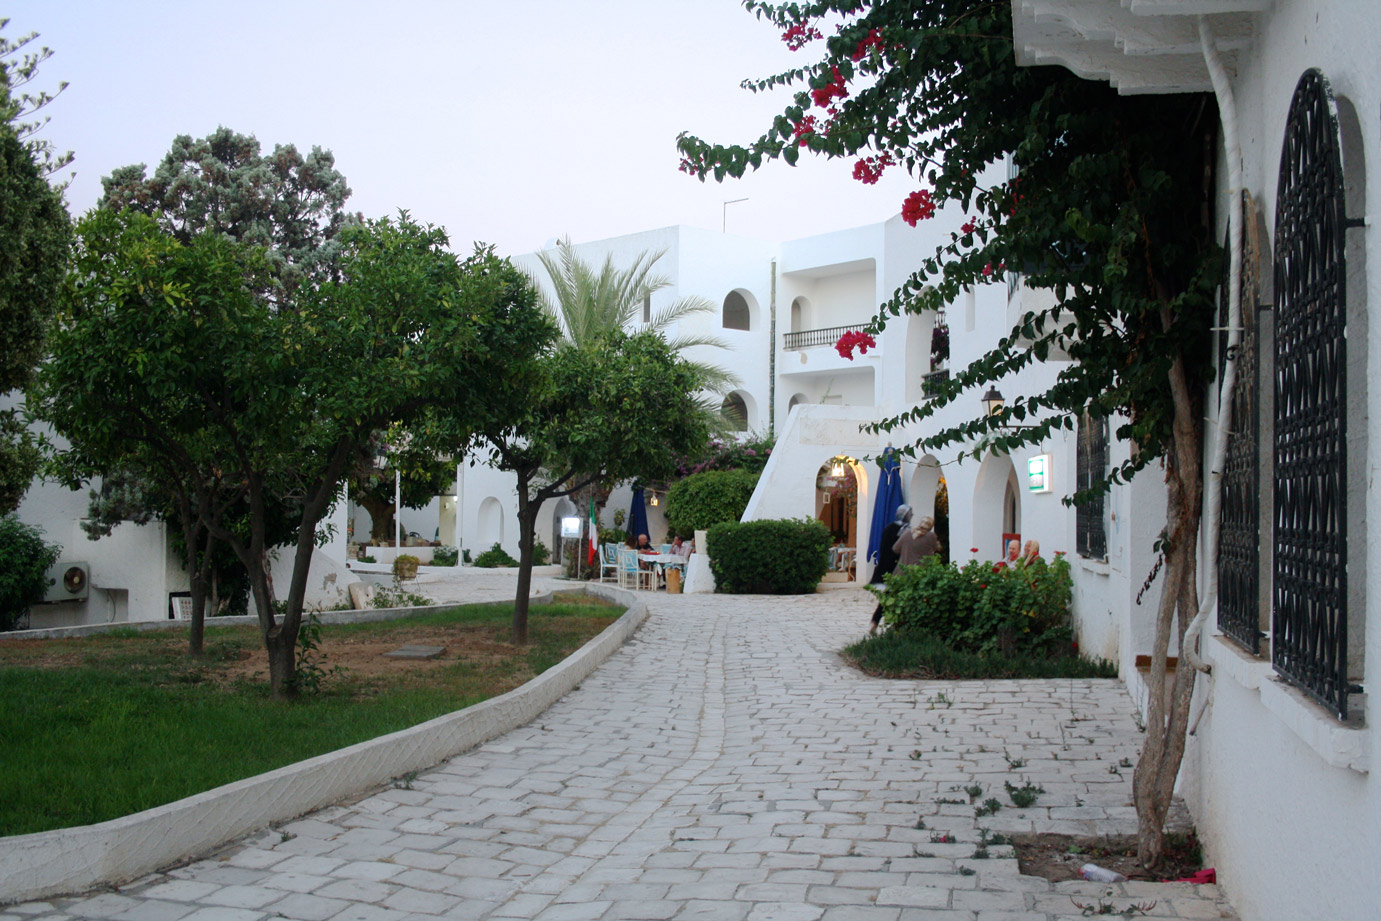 TUNISIA PHOTO DIARY III. 8